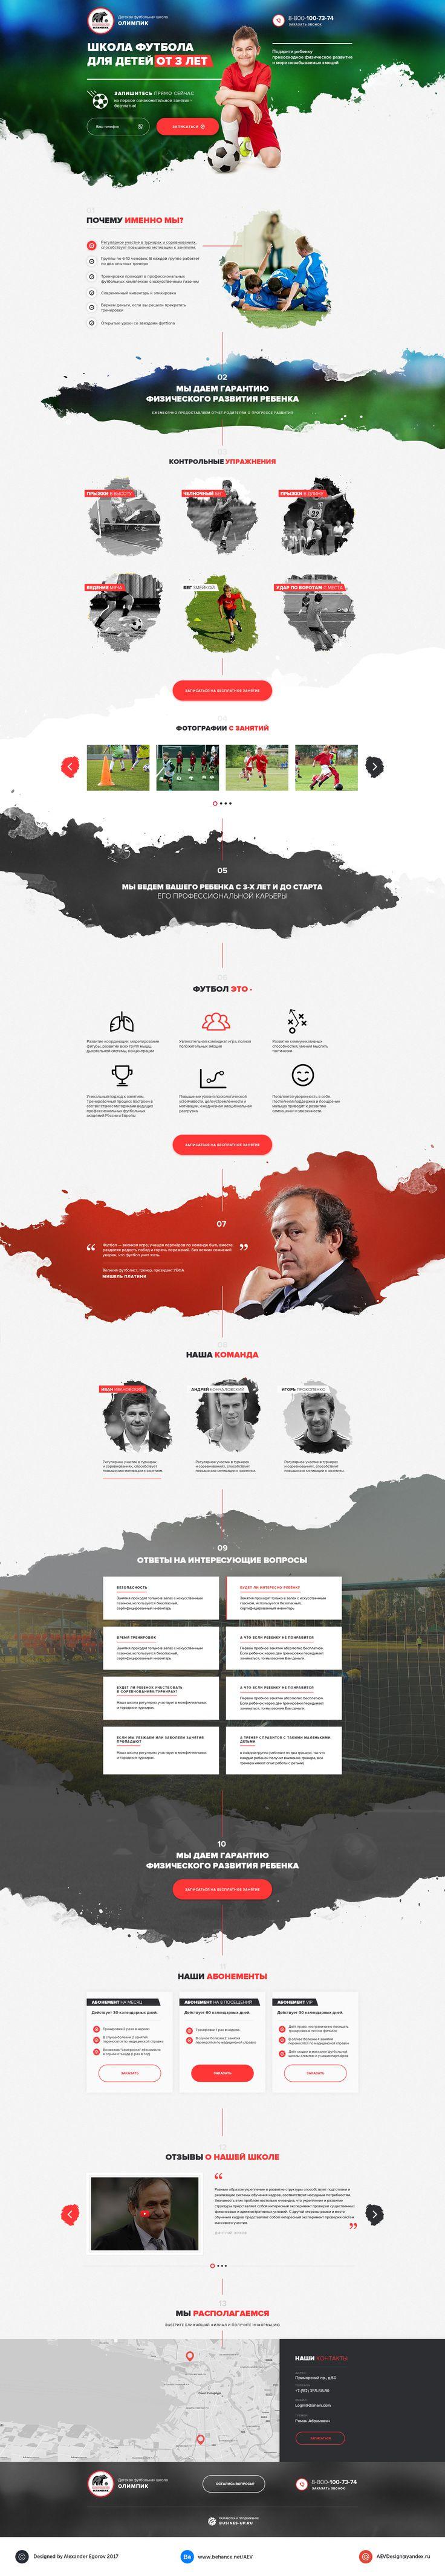 Школа футбола для детей. Landing Page Football School. Design by Alexander Egorov